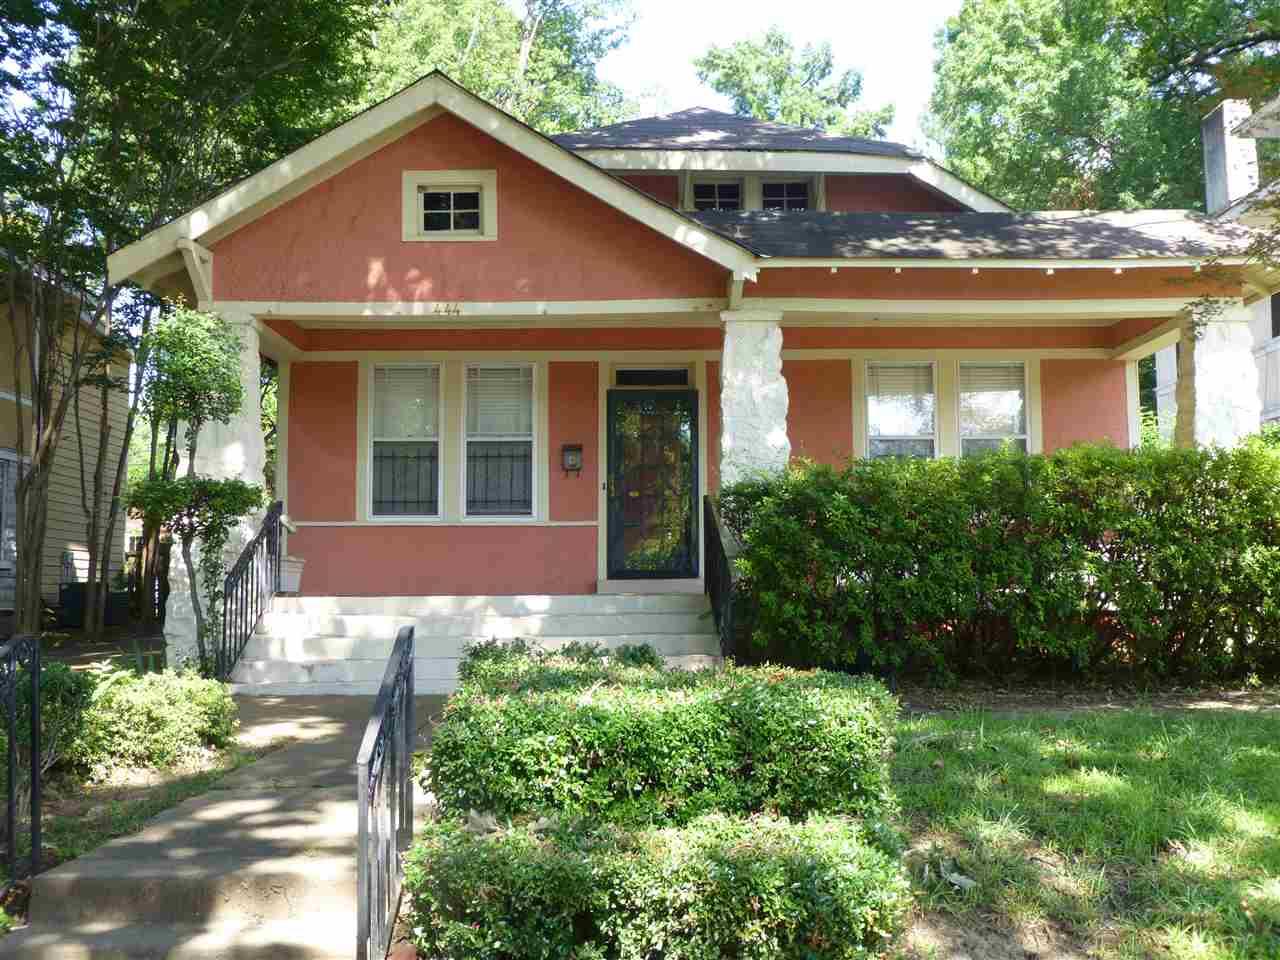 444 N MCNEIL ST, Memphis, TN 38112